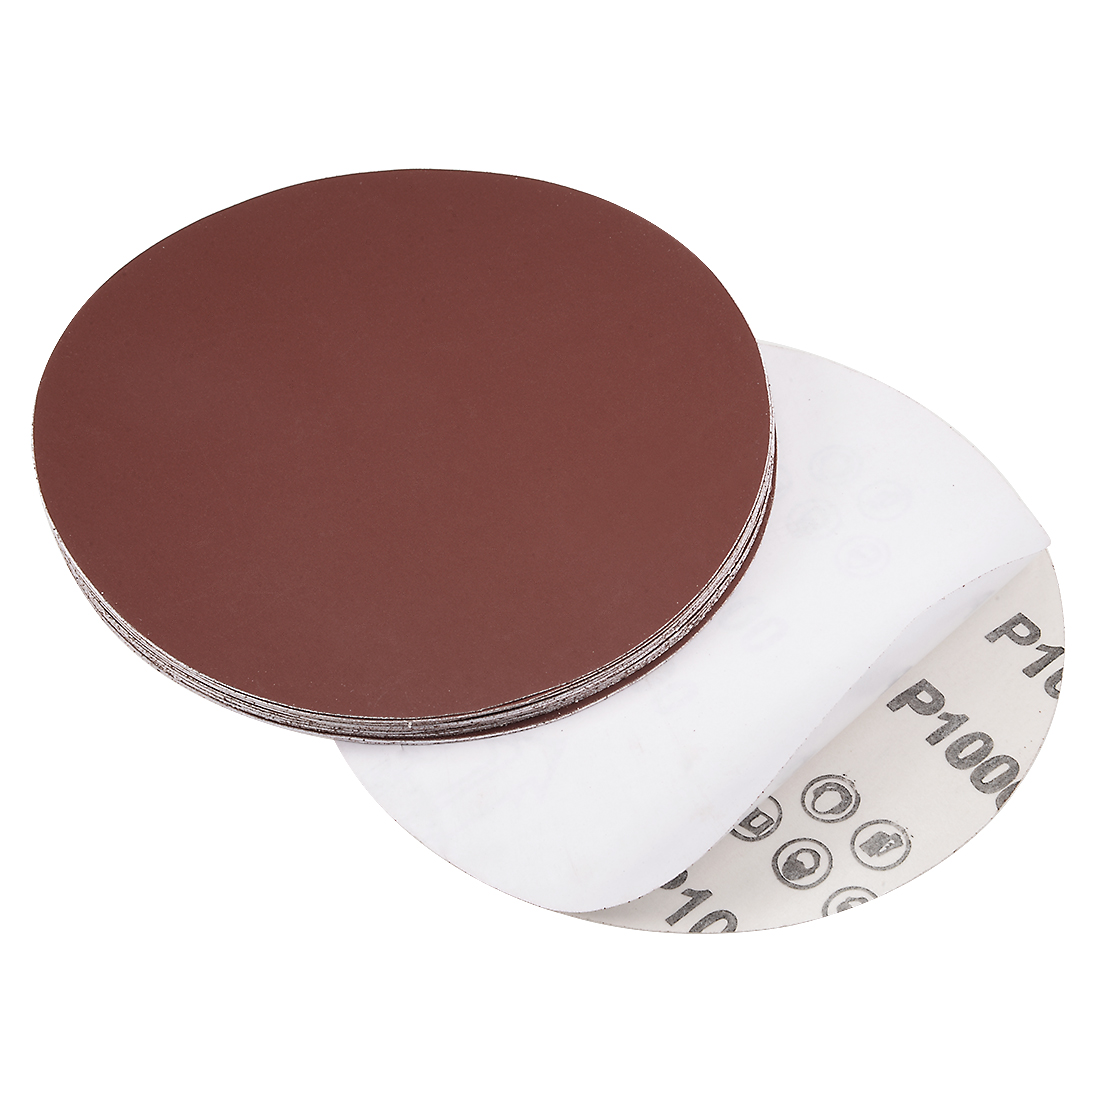 6-inch 1000-Grits PSA Sanding Disc, Adhesive-Backed for Orbital Sander 20pcs